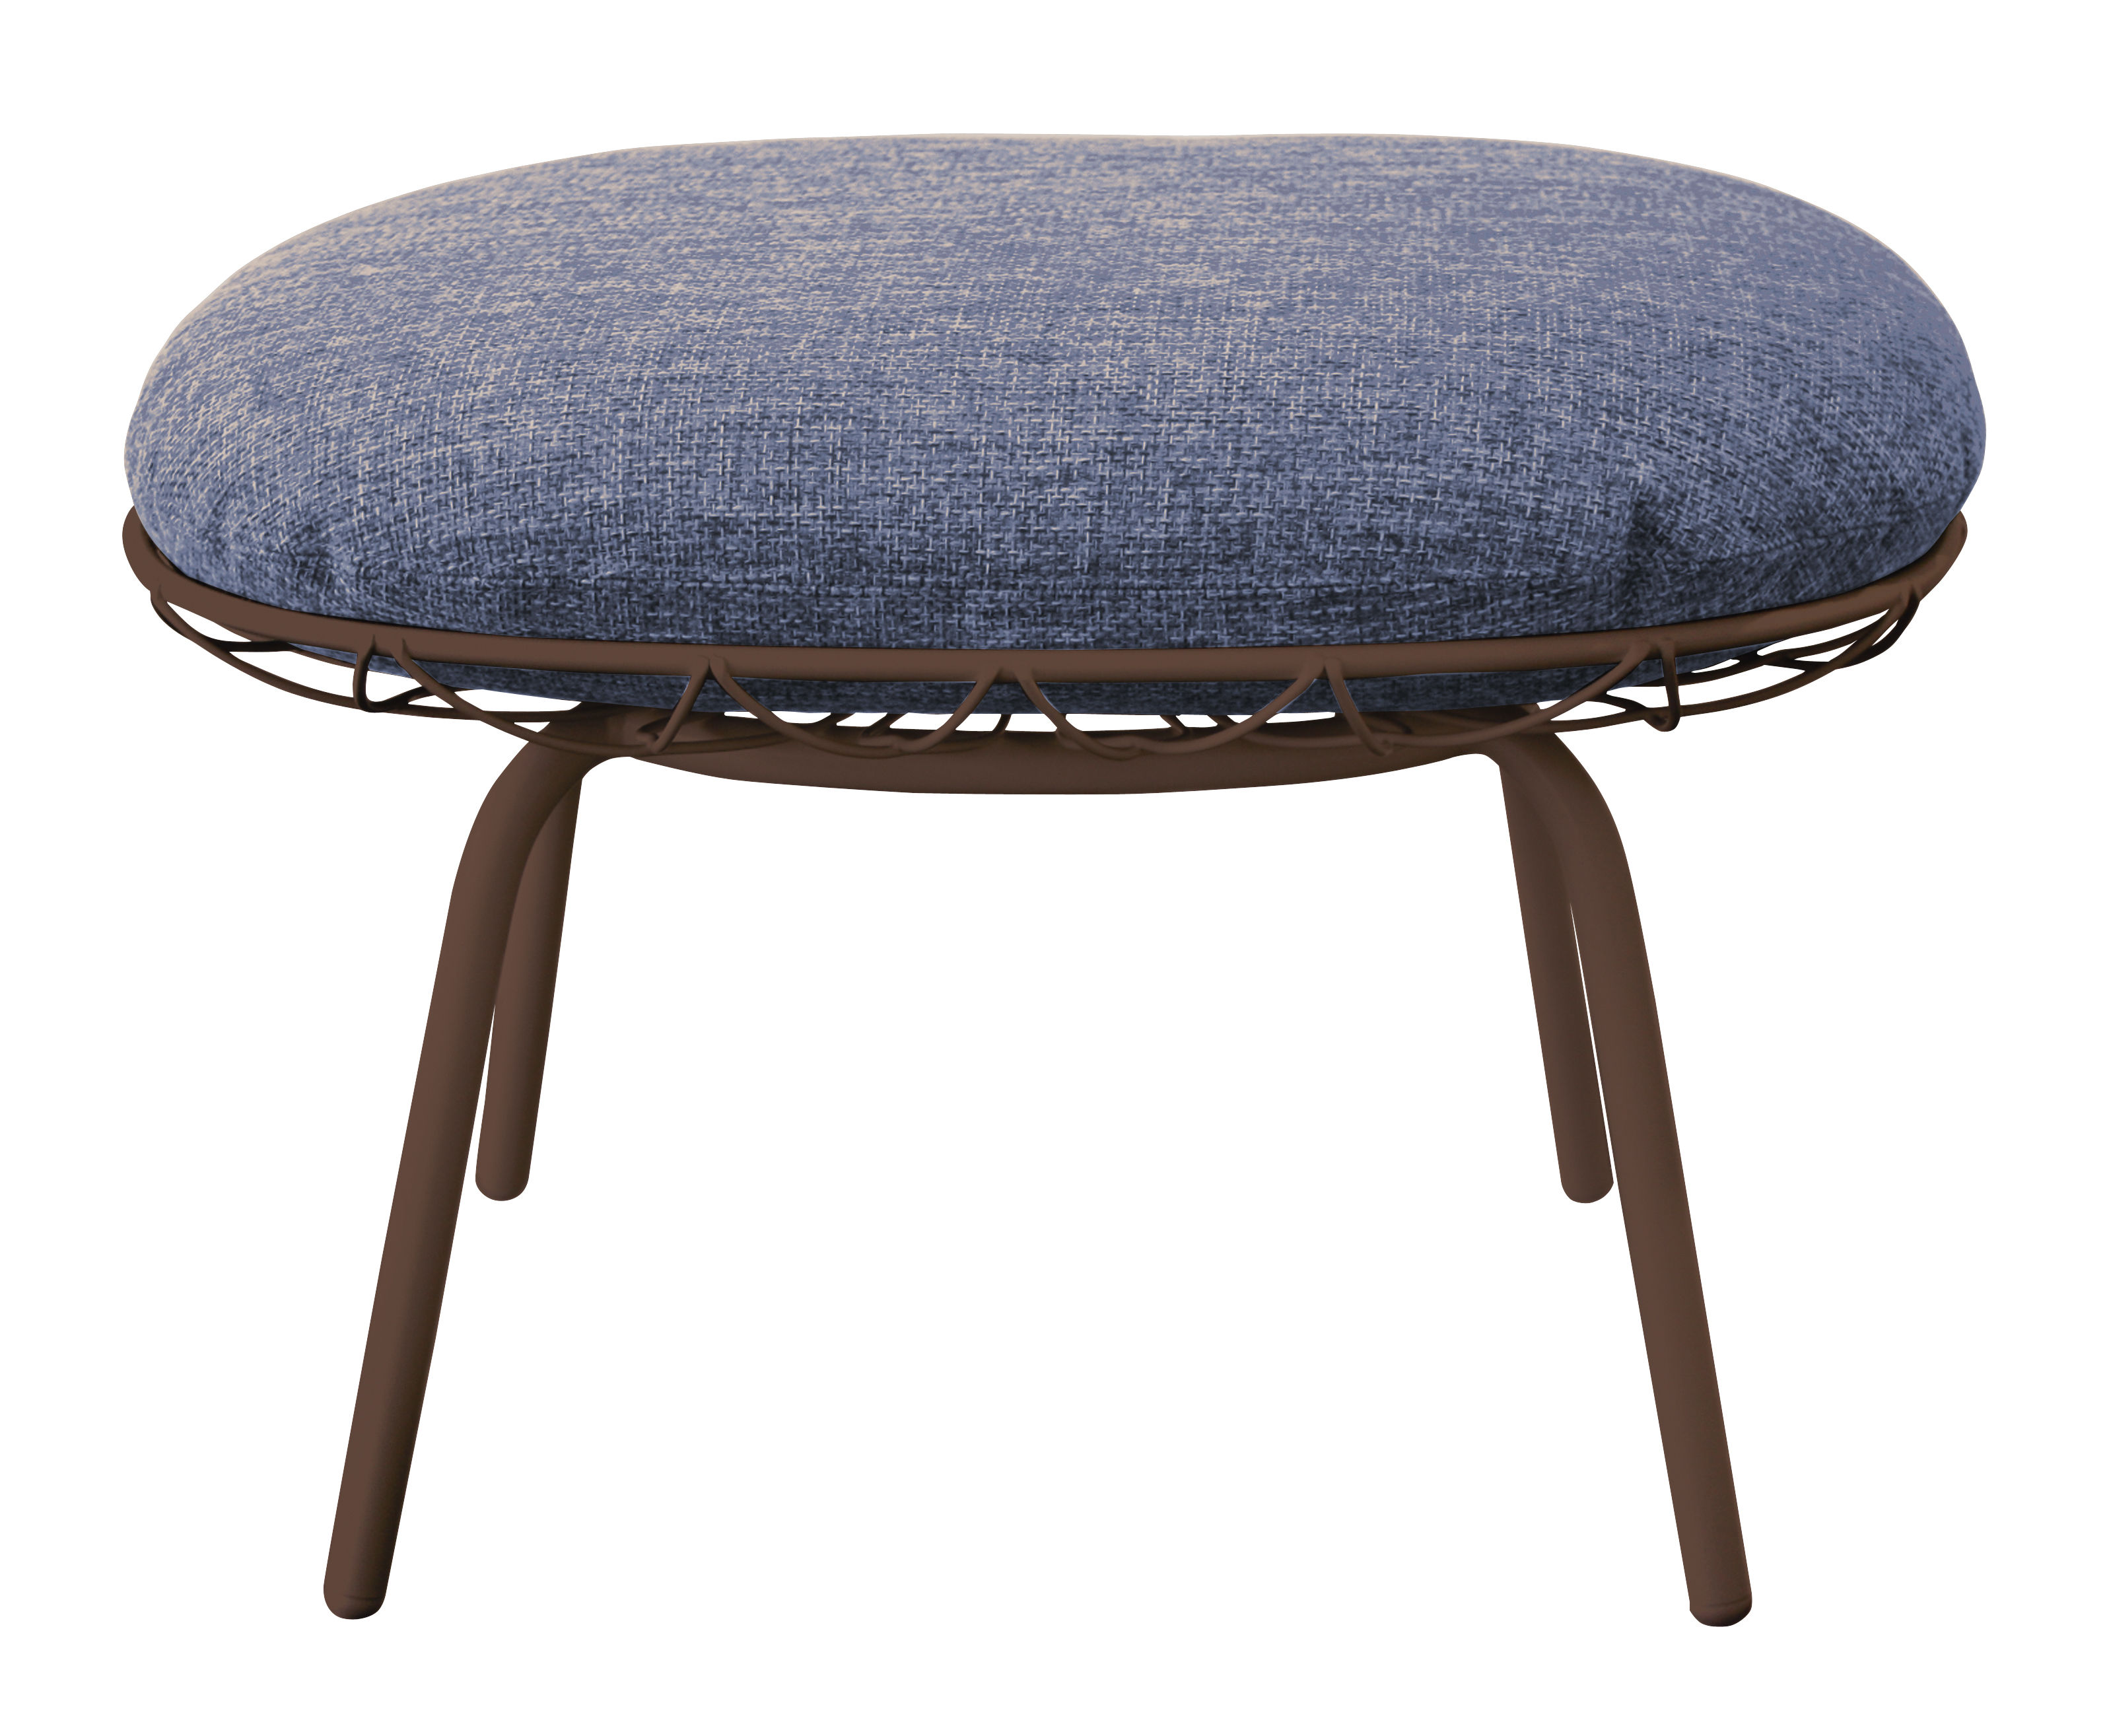 pouf pina outdoor repose pieds tissu structure marron coussin marron bleu magis. Black Bedroom Furniture Sets. Home Design Ideas